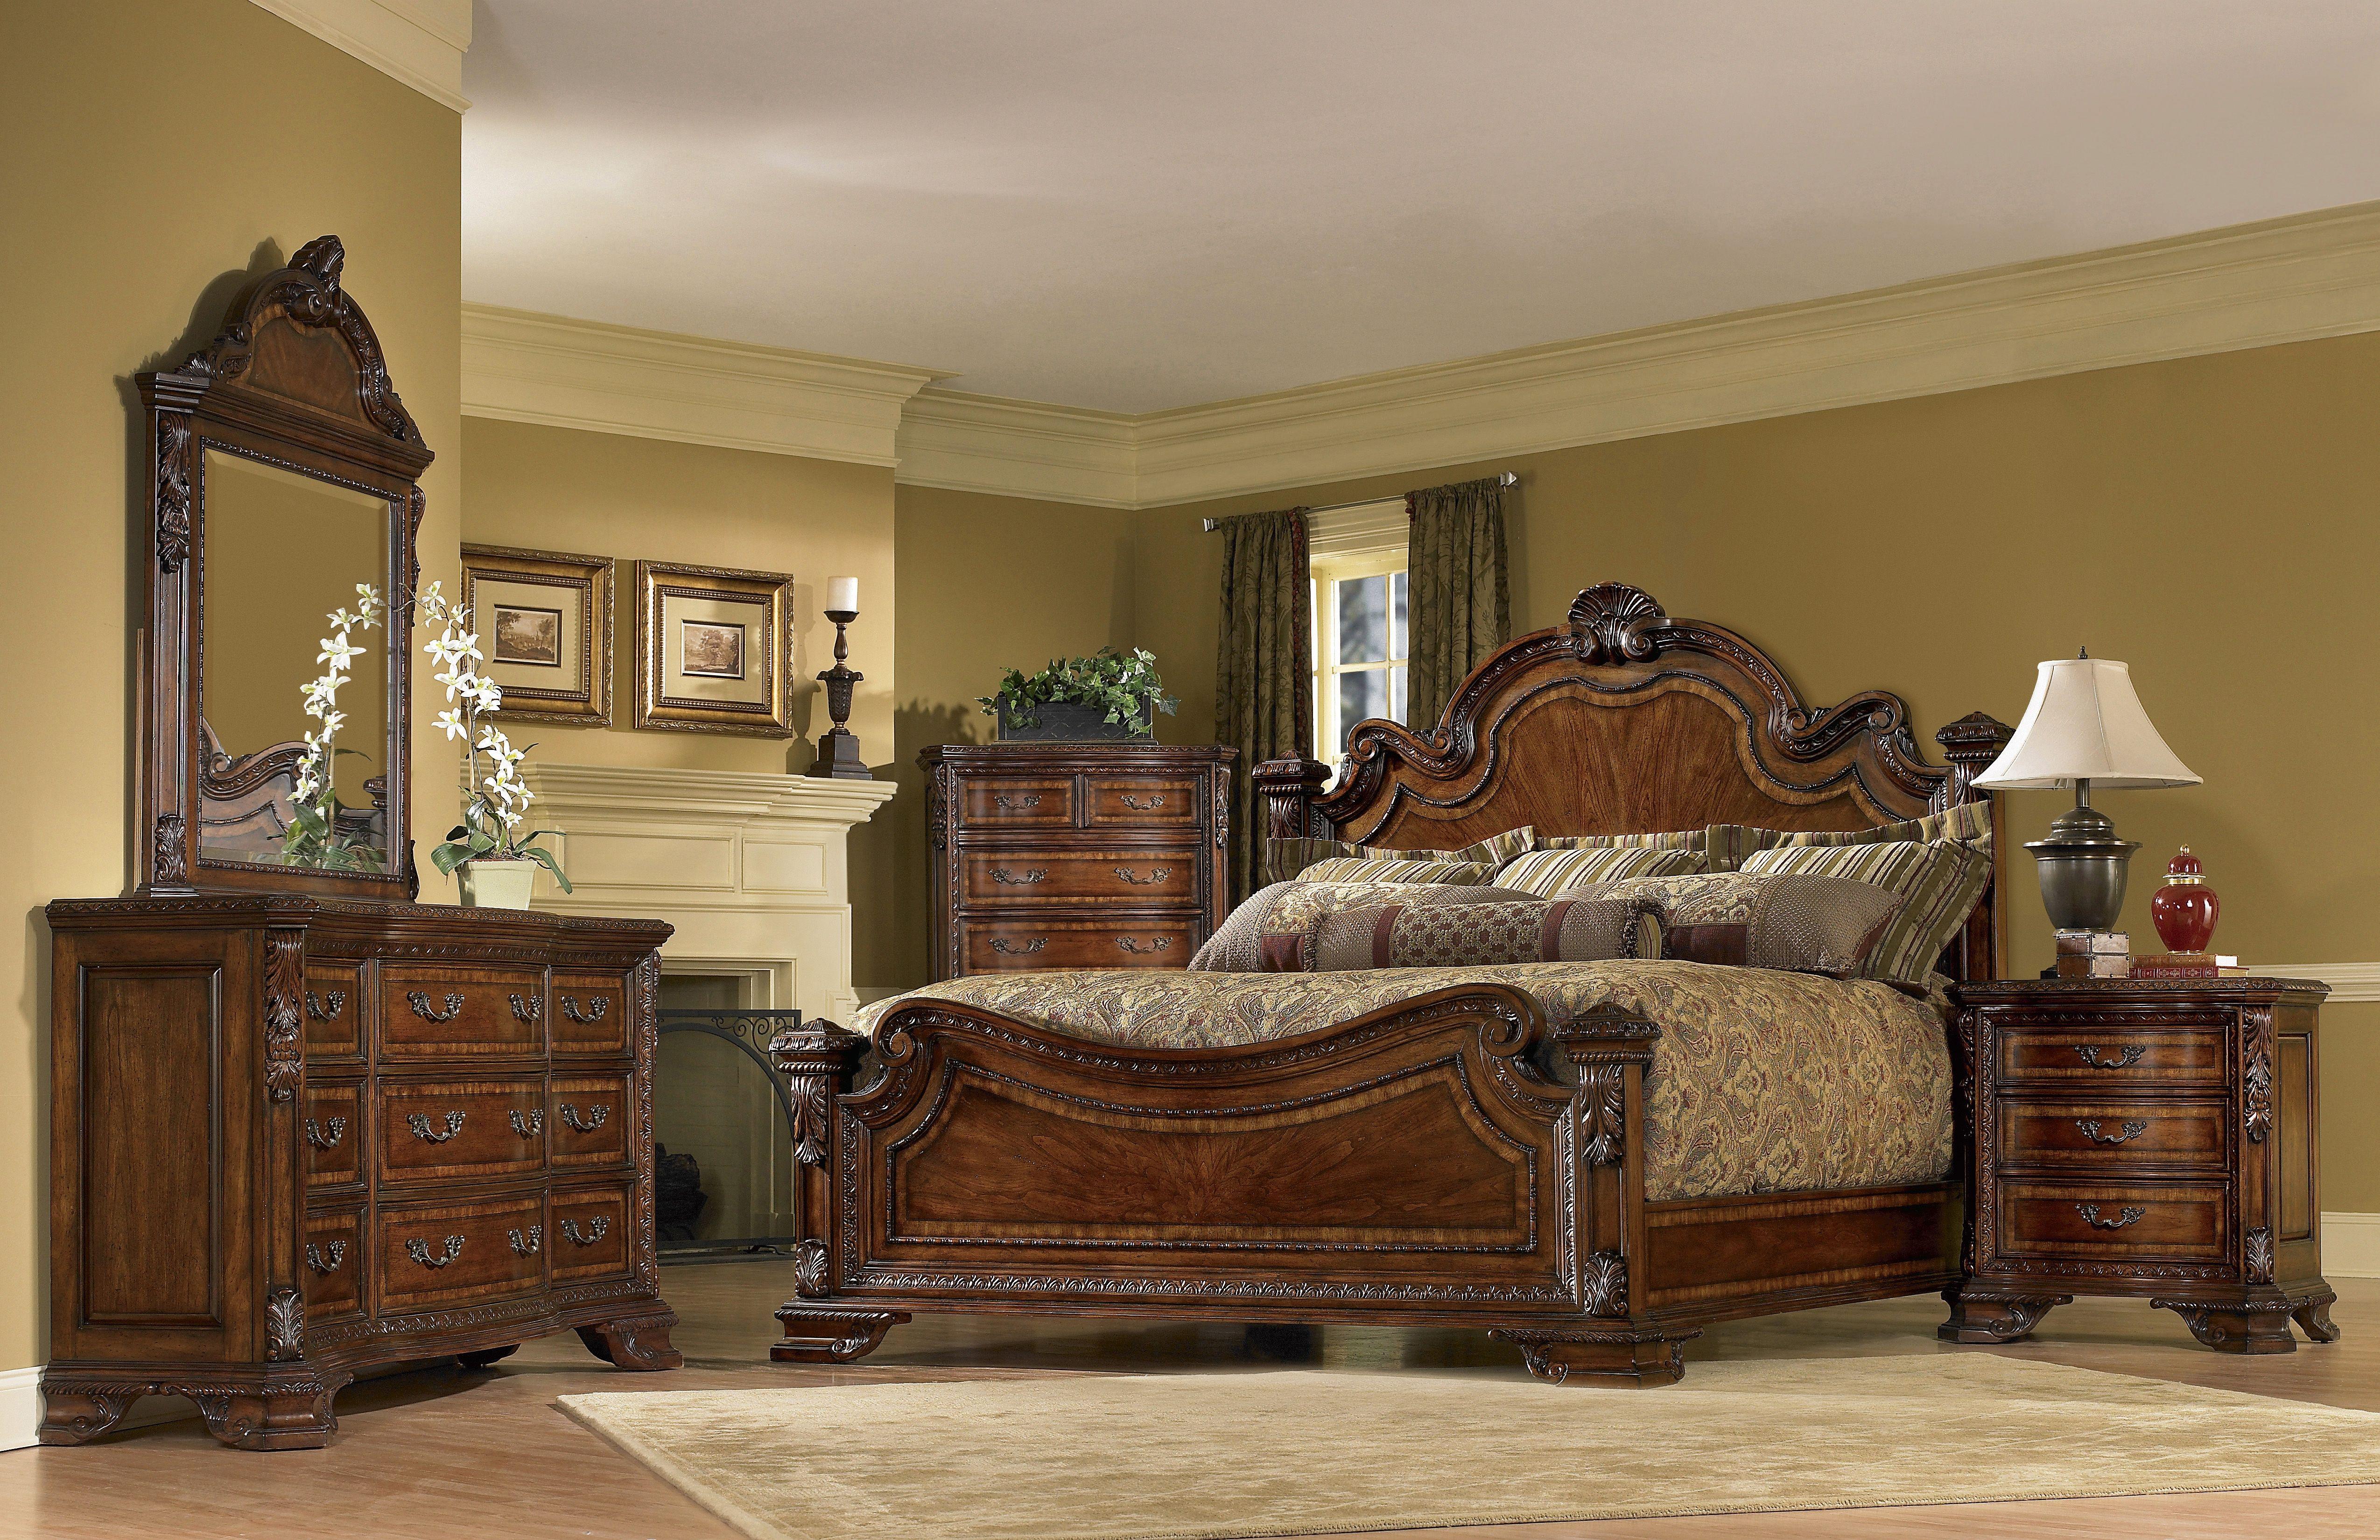 king size bedroom sets | AICO 6pc Windsor Court King Size Bedroom ...